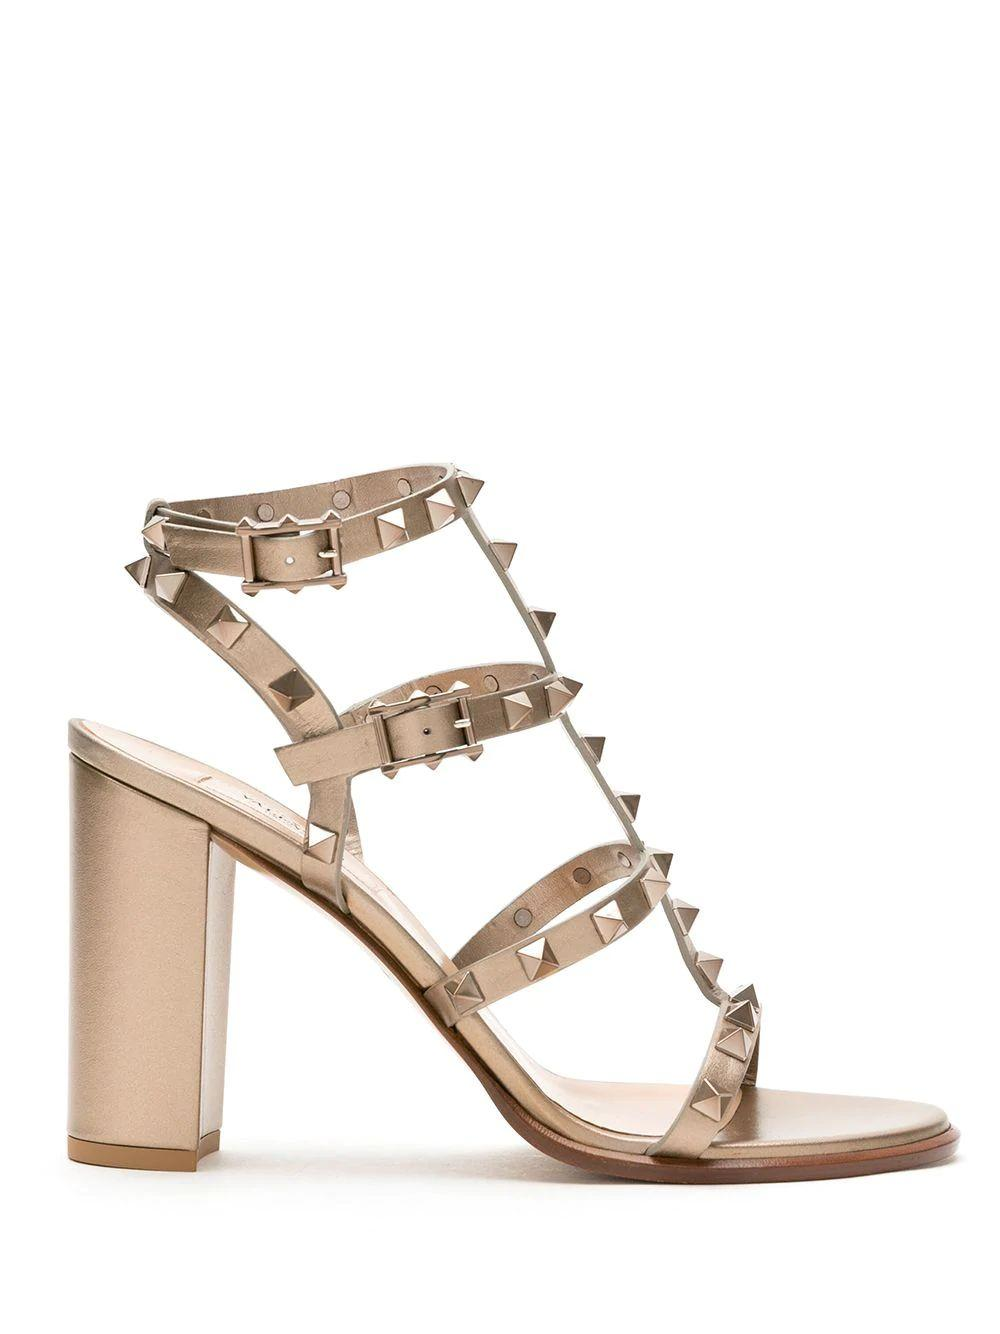 Rockstud Block Heel Sandals Item # VW2S0749RZD